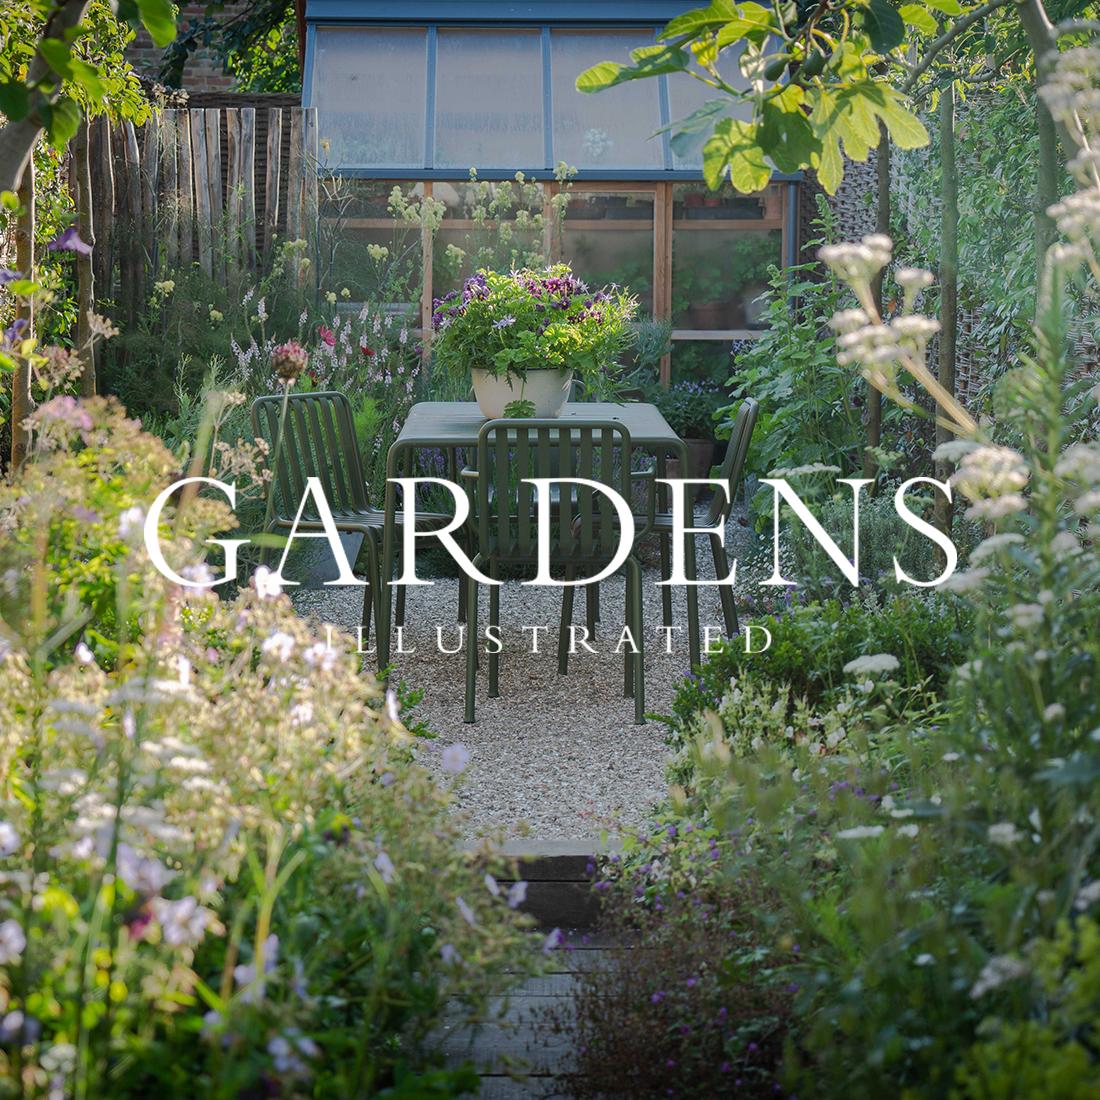 Gardens Illustrated - Whitstable Coastal Garden